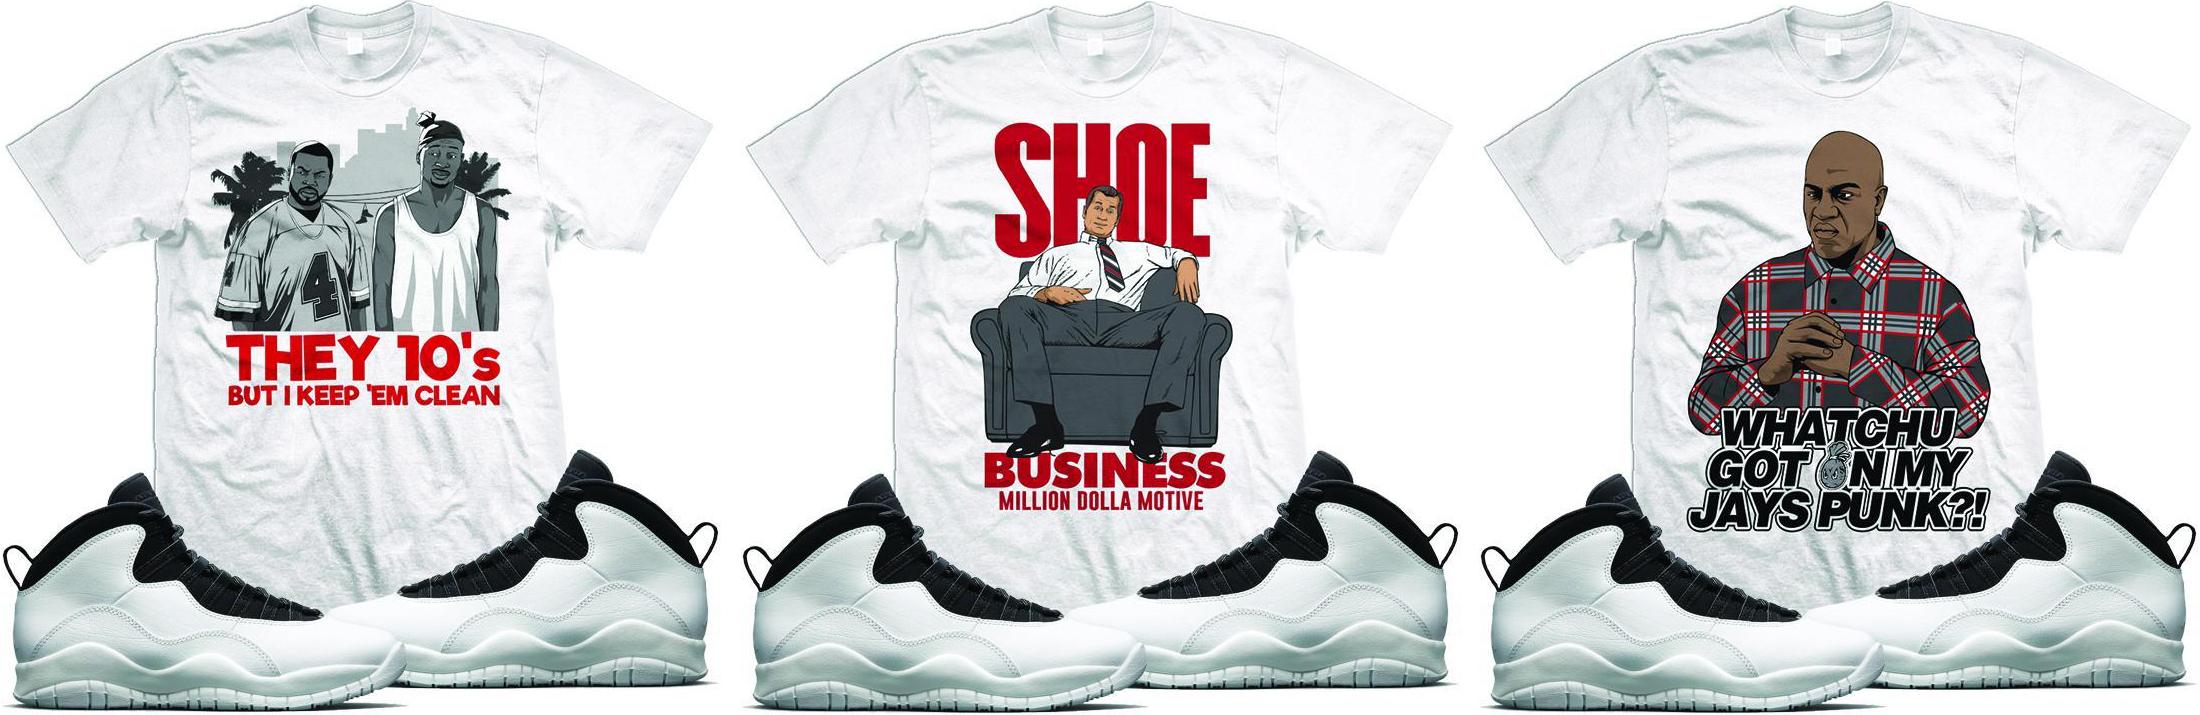 b9987b5bef1 jordan-10-im-back-sneaker-tees. Matching up with the Air ...